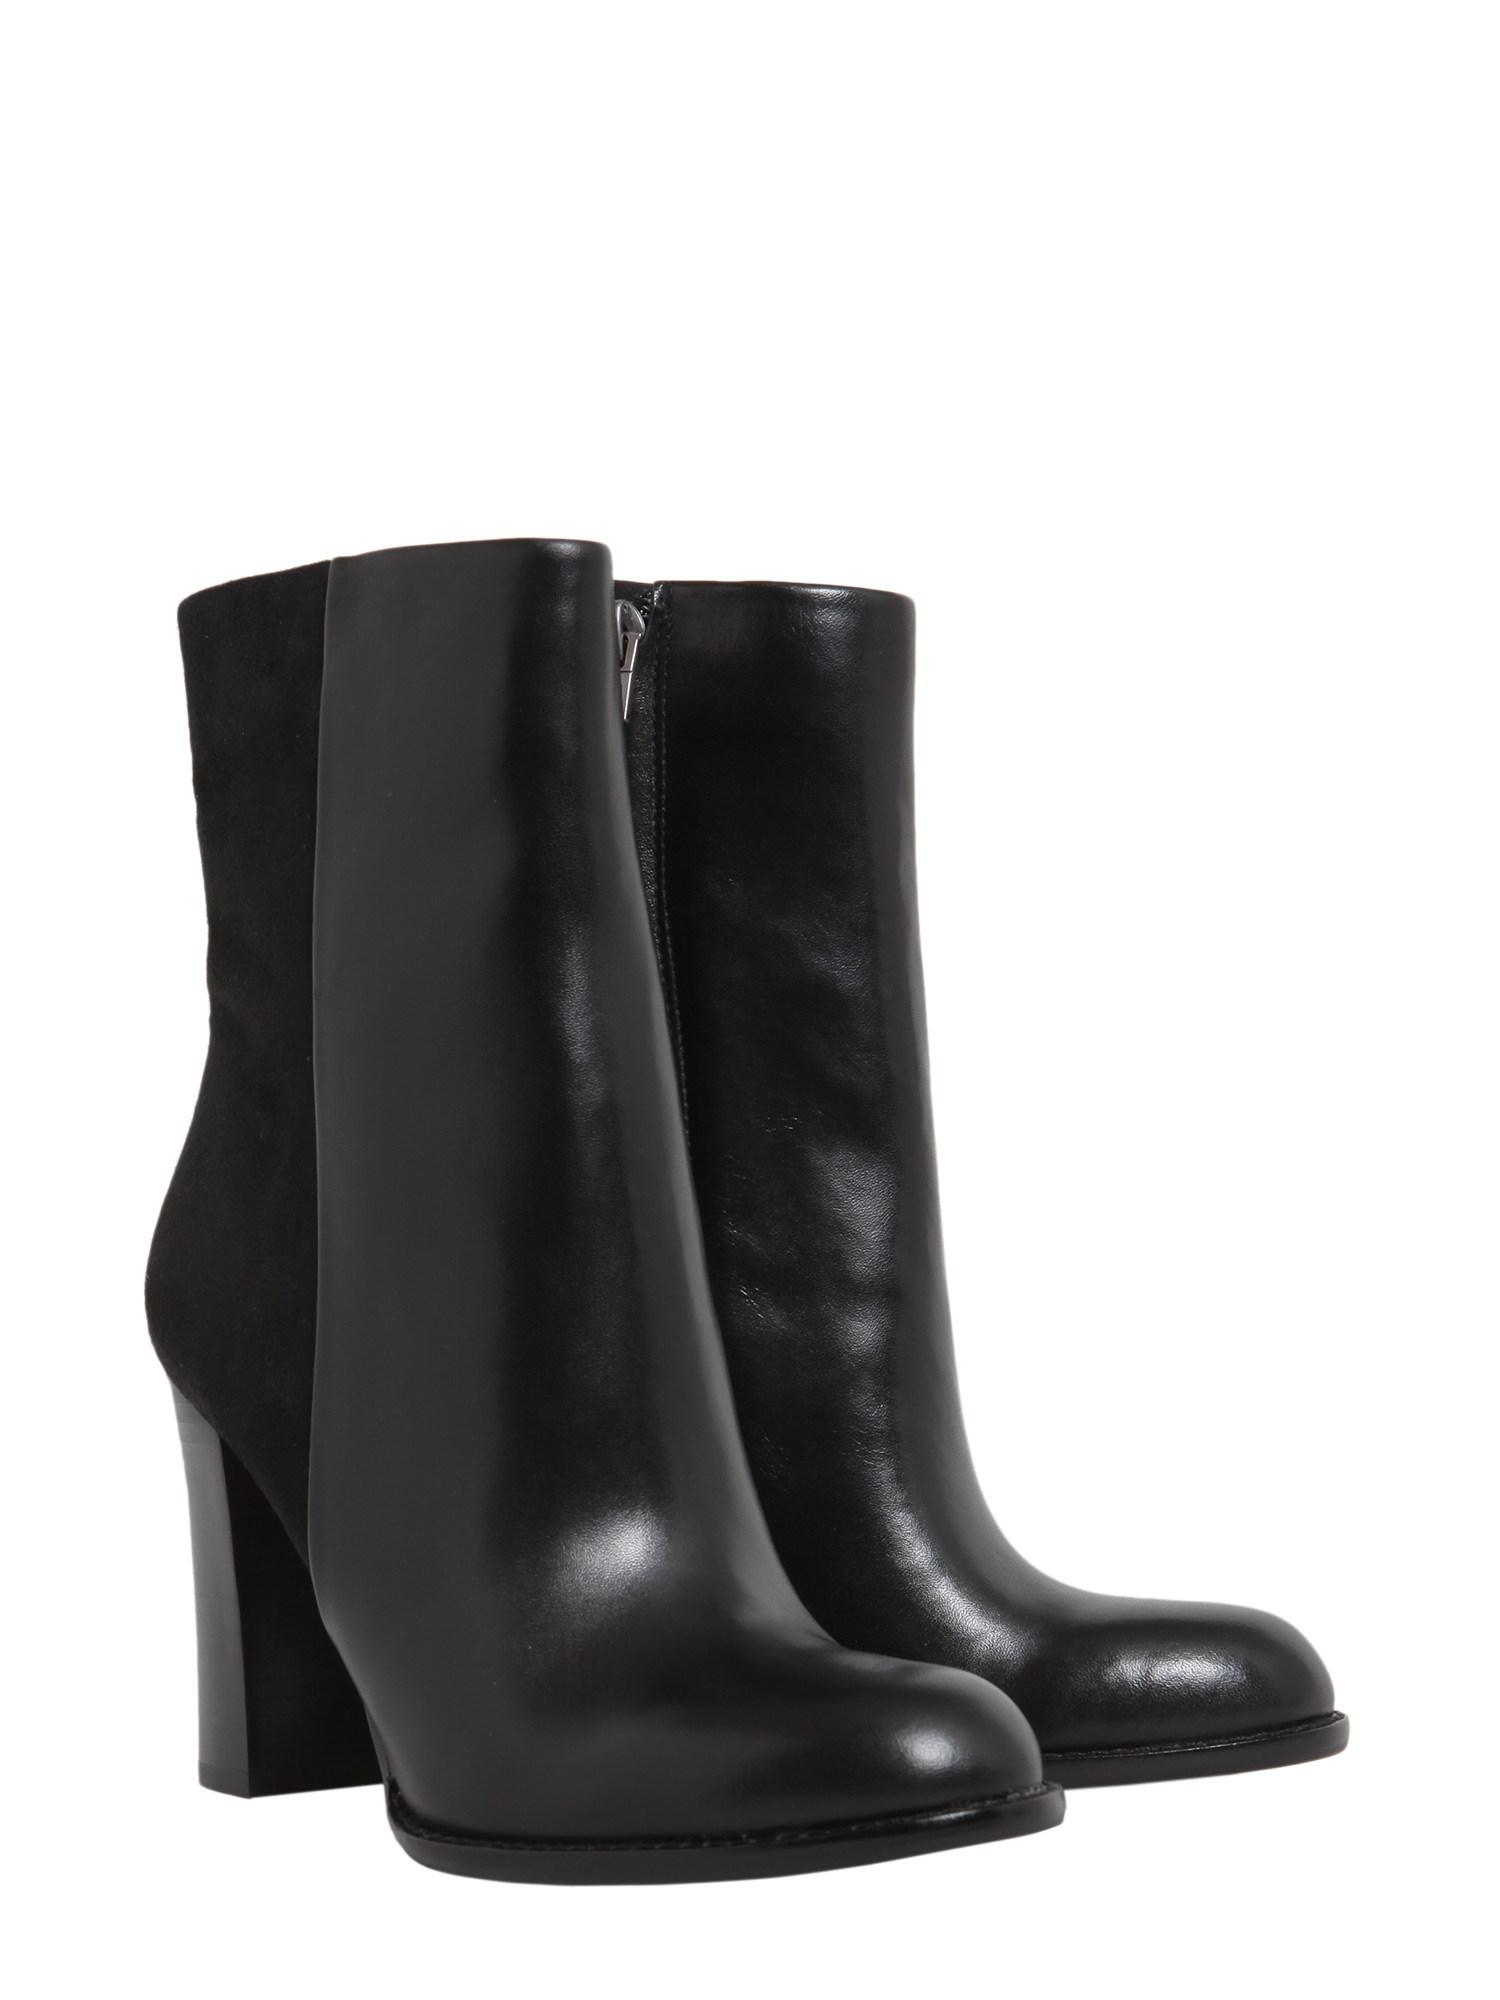 7d2d6cb81 Lyst - Sam Edelman Reyes Leather Boots in Black